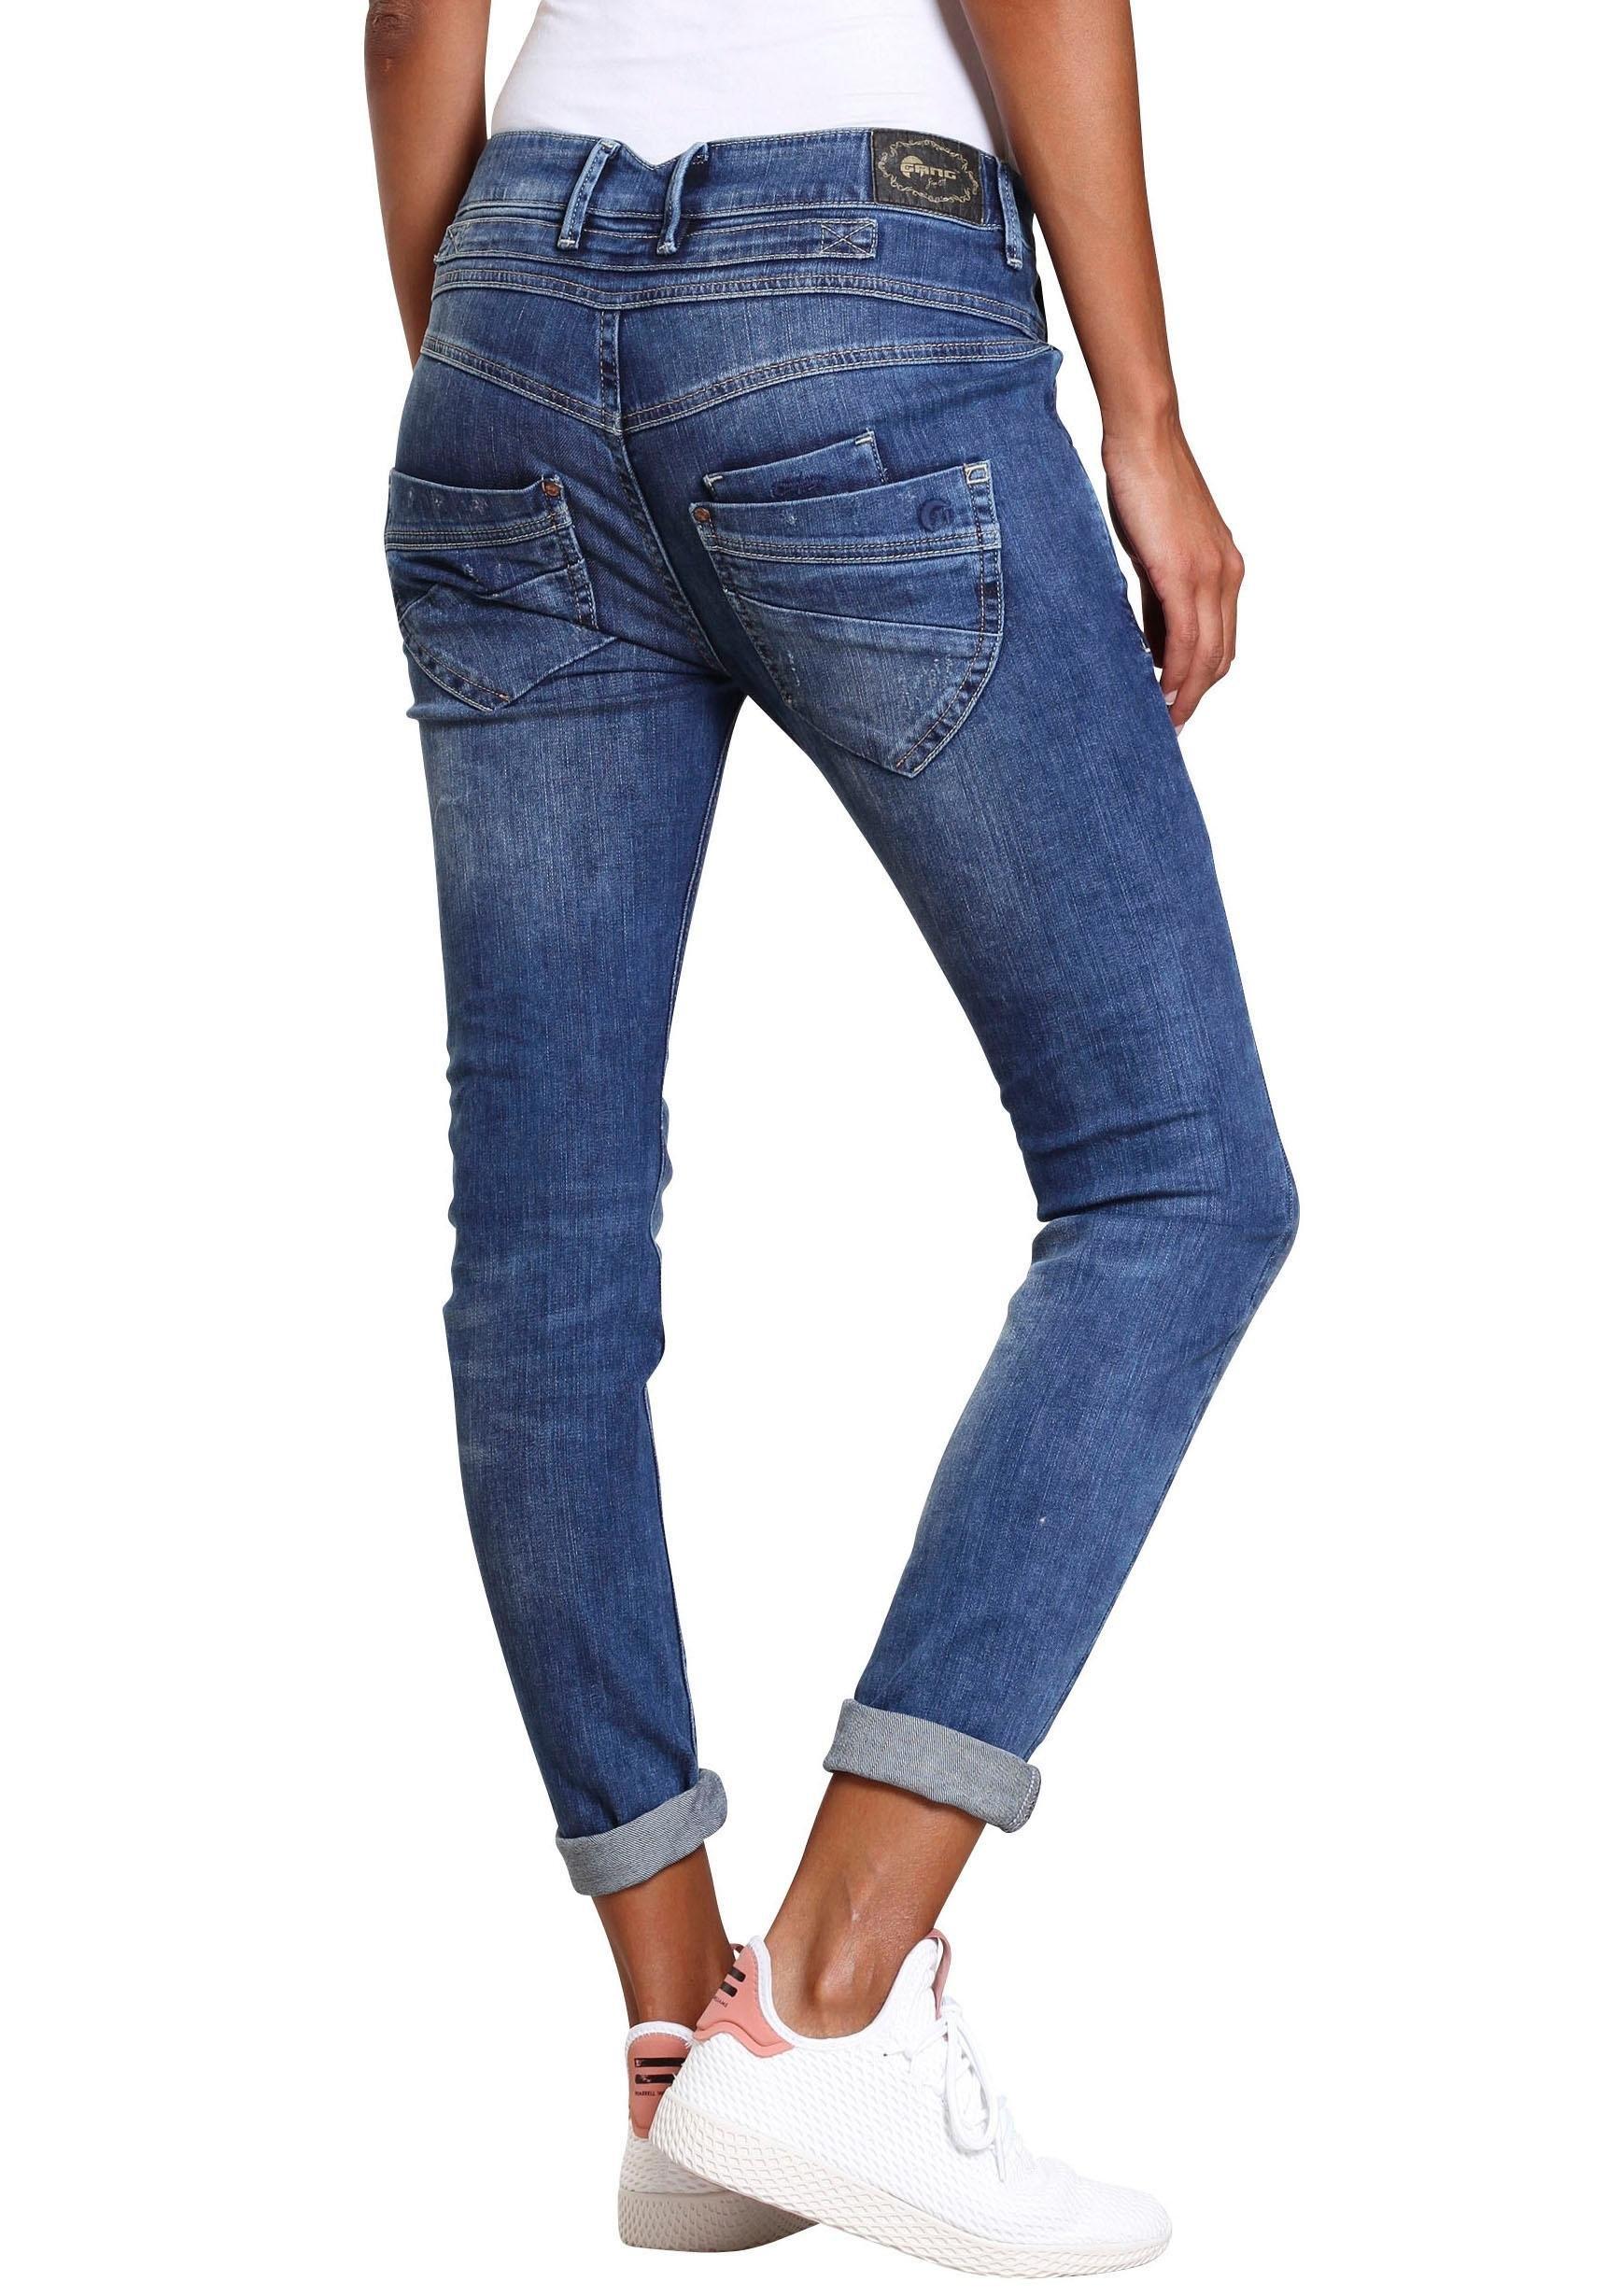 GANG Slim fit jeans Marge met bijzondere 4-knoopssluiting - gratis ruilen op otto.nl